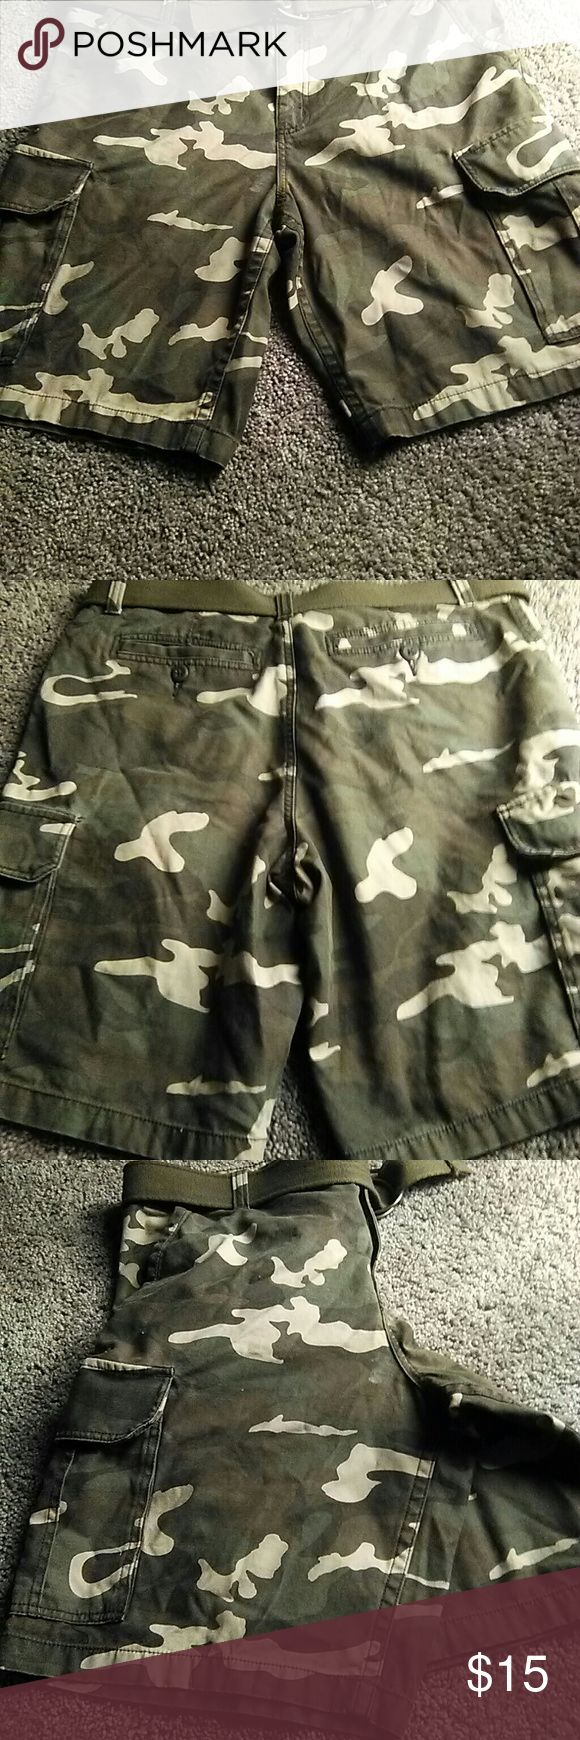 Mens camo shorts Army fatigue men's short, spring wear at a reasonable price American Apparel Shorts